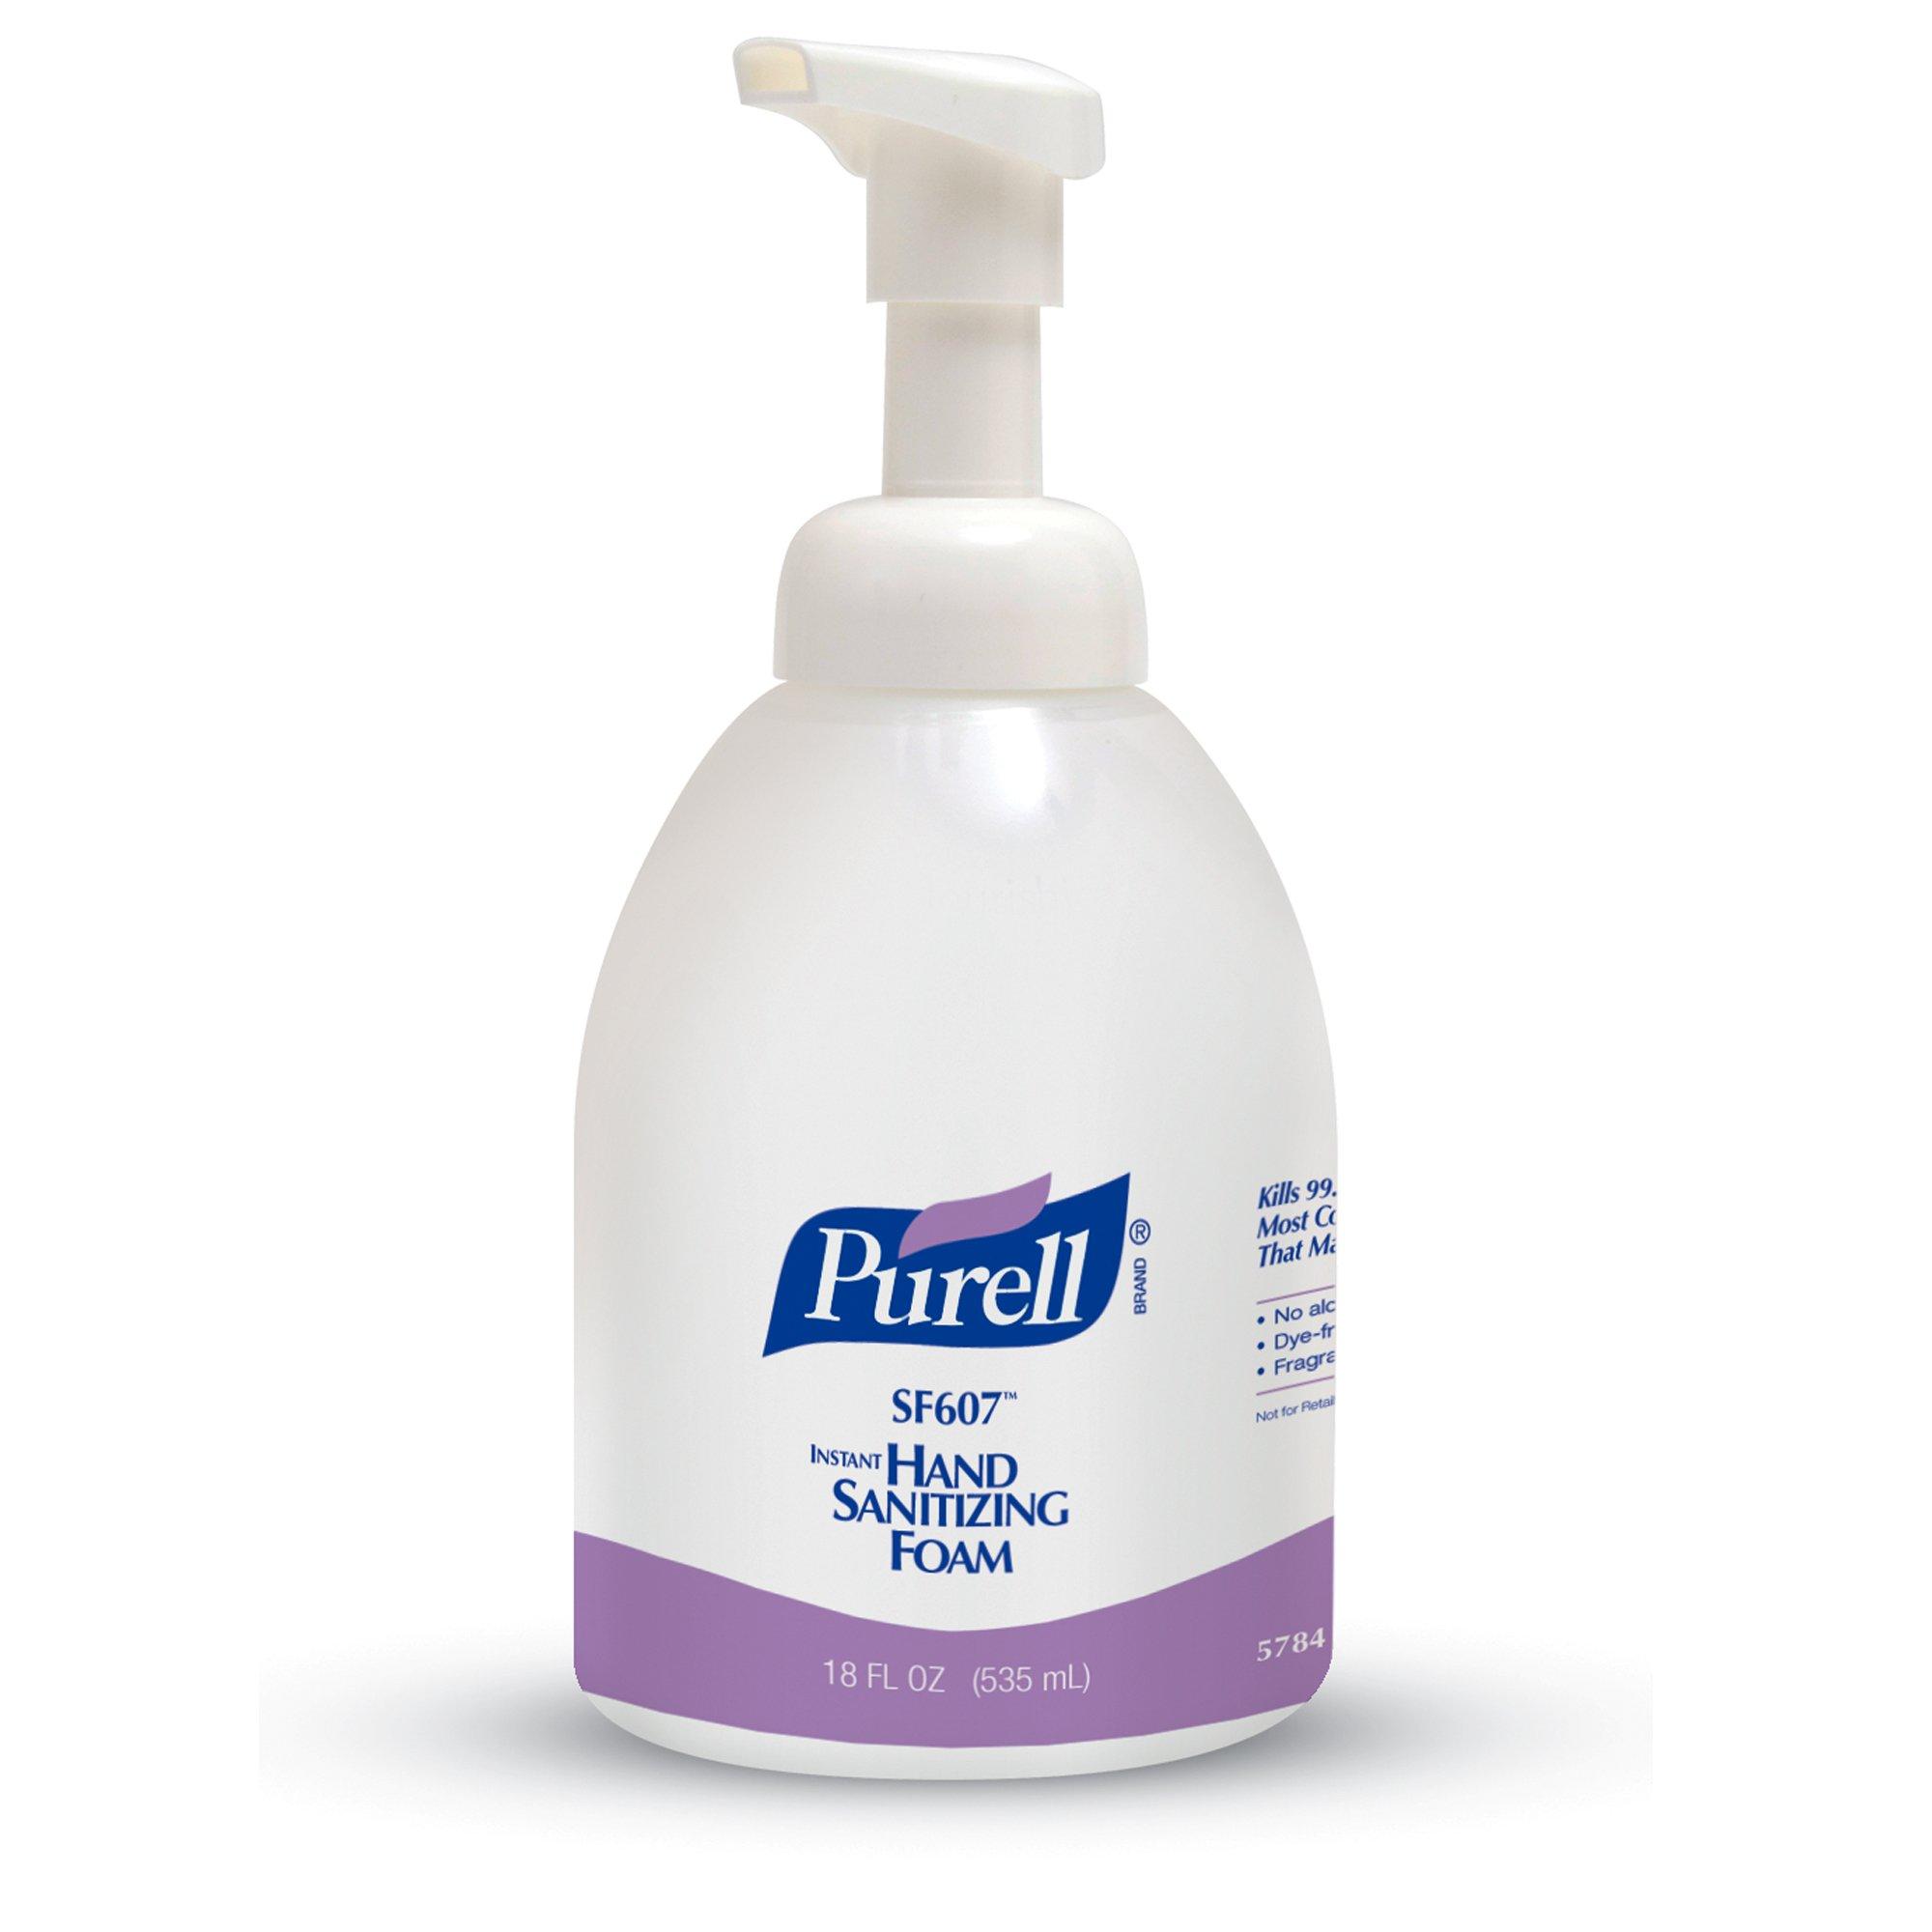 PURELL SF607 Advanced Hand Sanitizer Foam, Fragrance Free, 535 mL Sanitizer Counter Top Pump Bottles (Pack of 4) - 5784-04